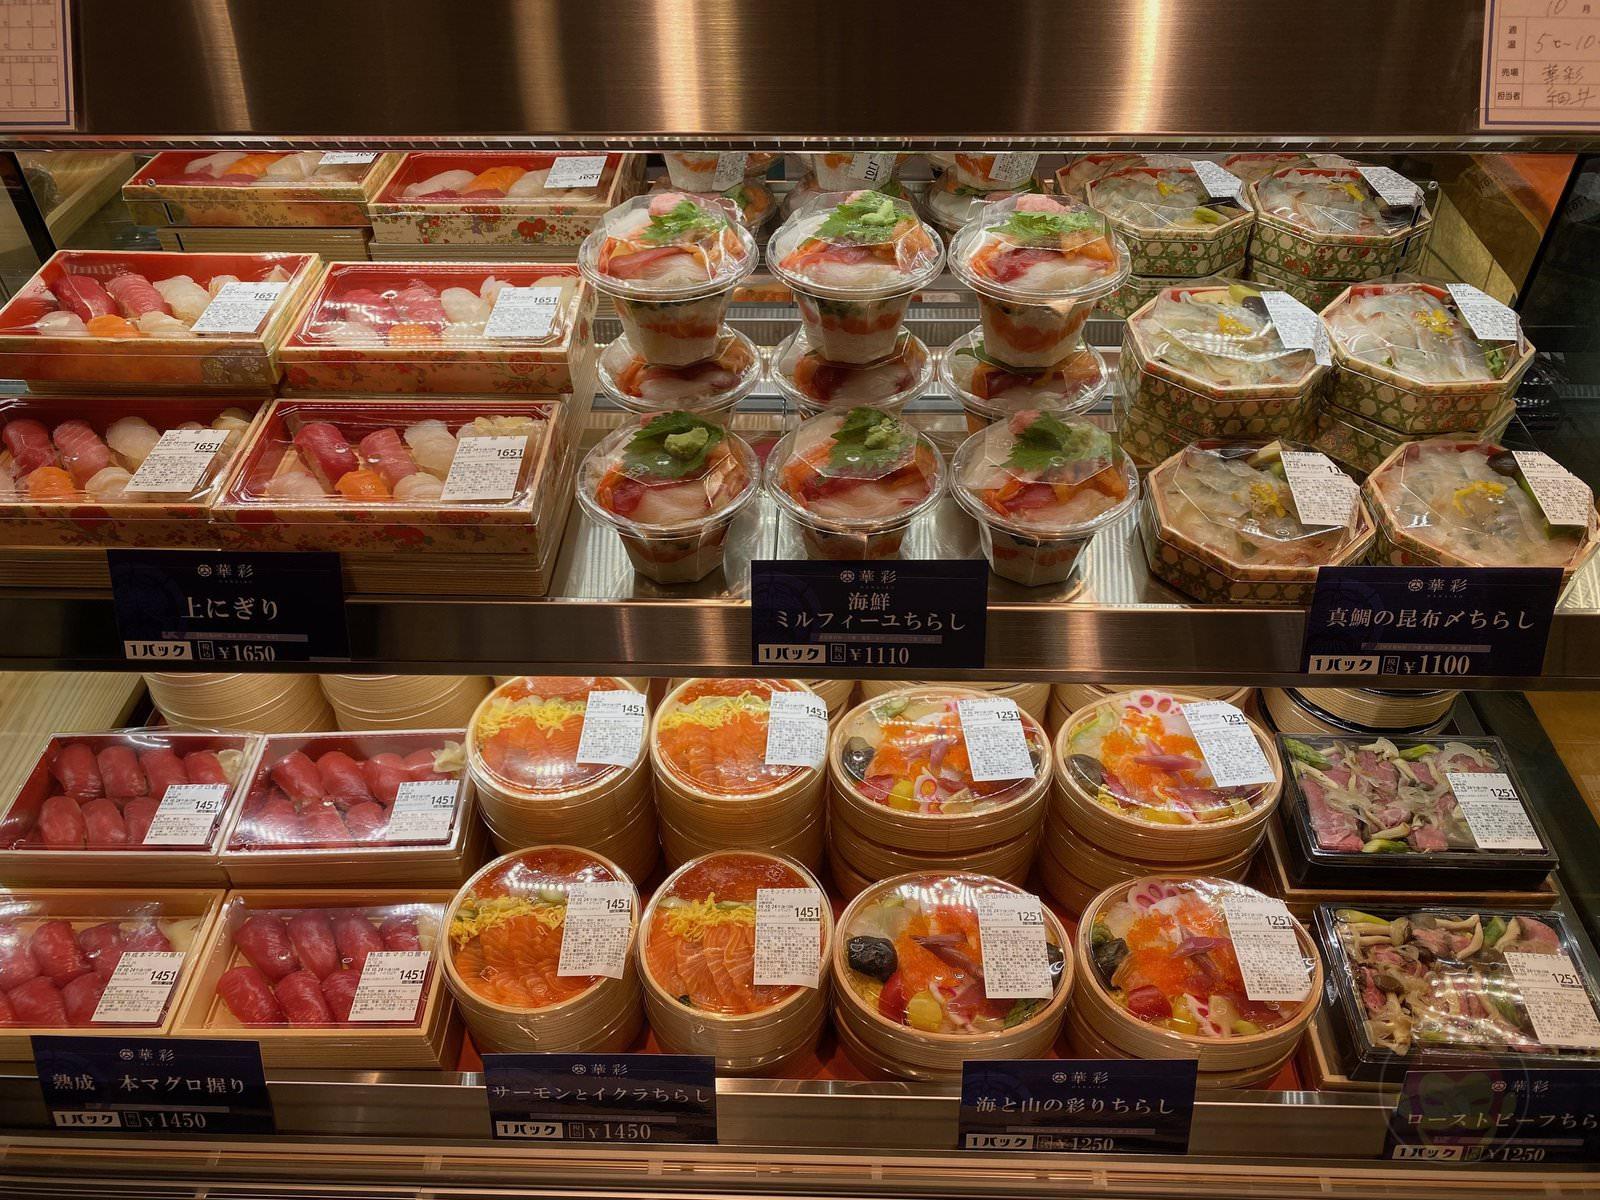 Shibuya-Scramble-Square-Food-I-Ate-122.jpeg